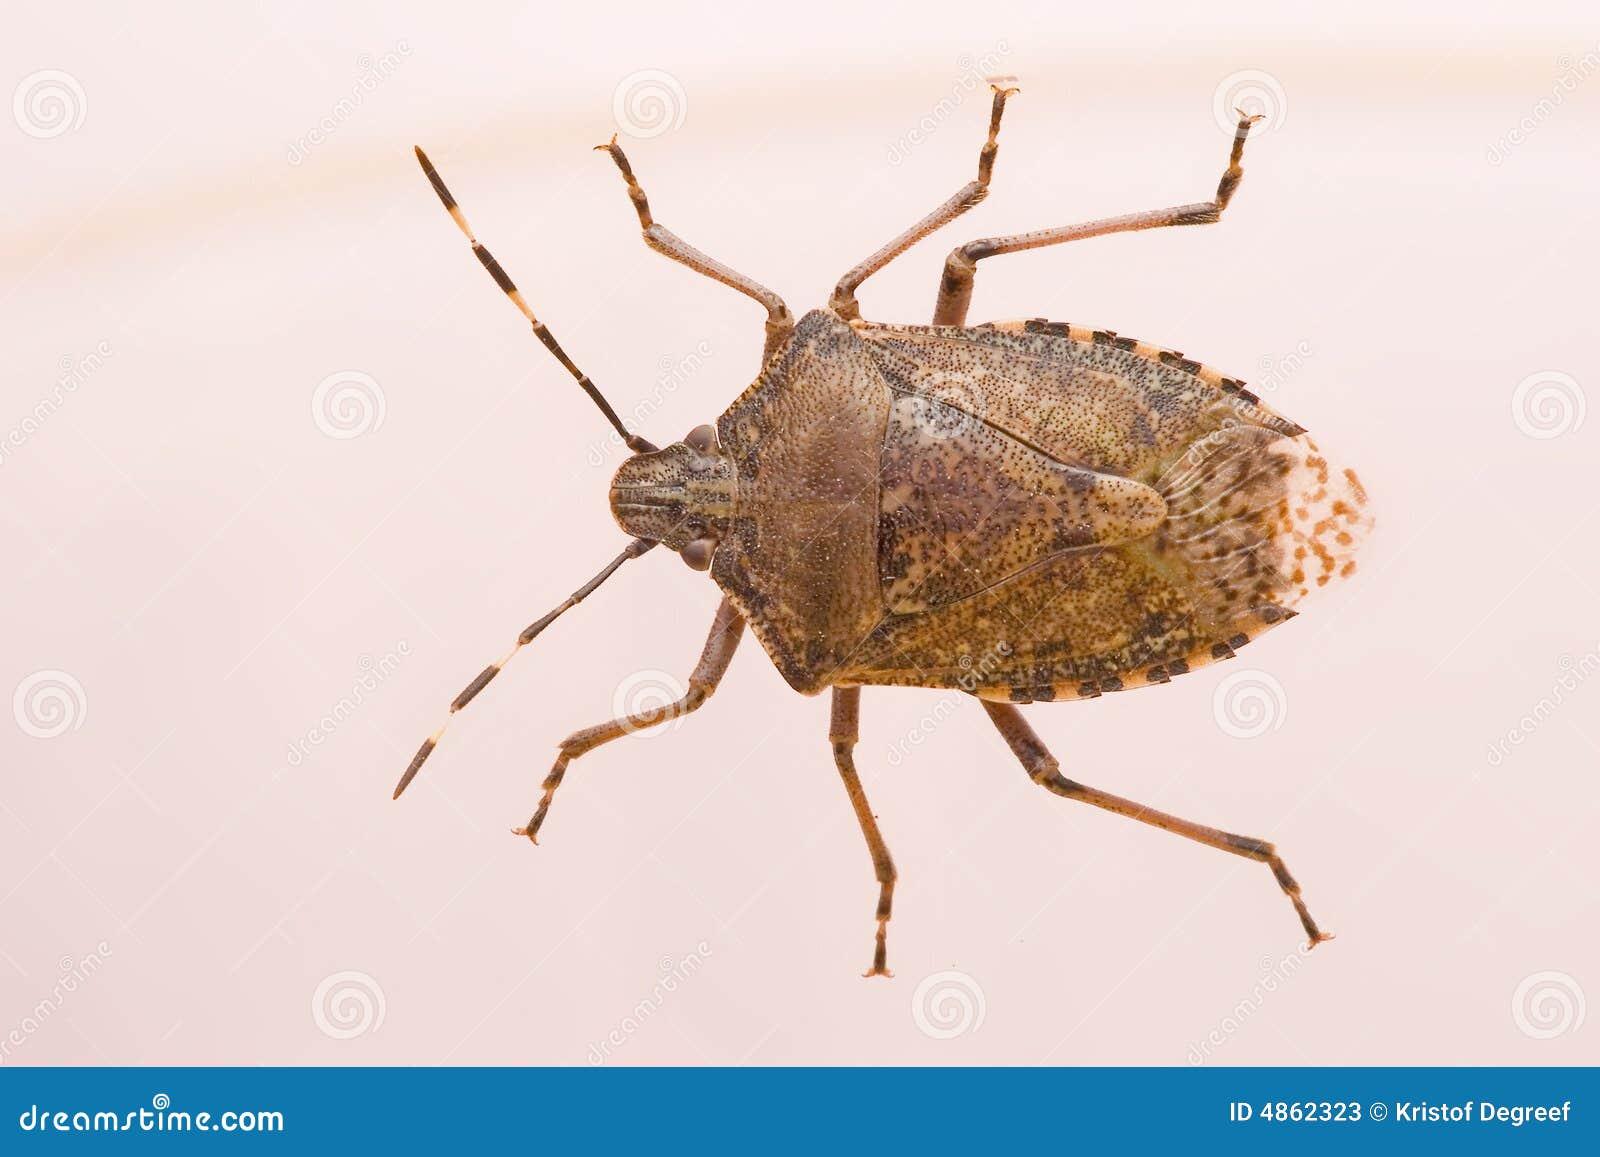 bedbugs images